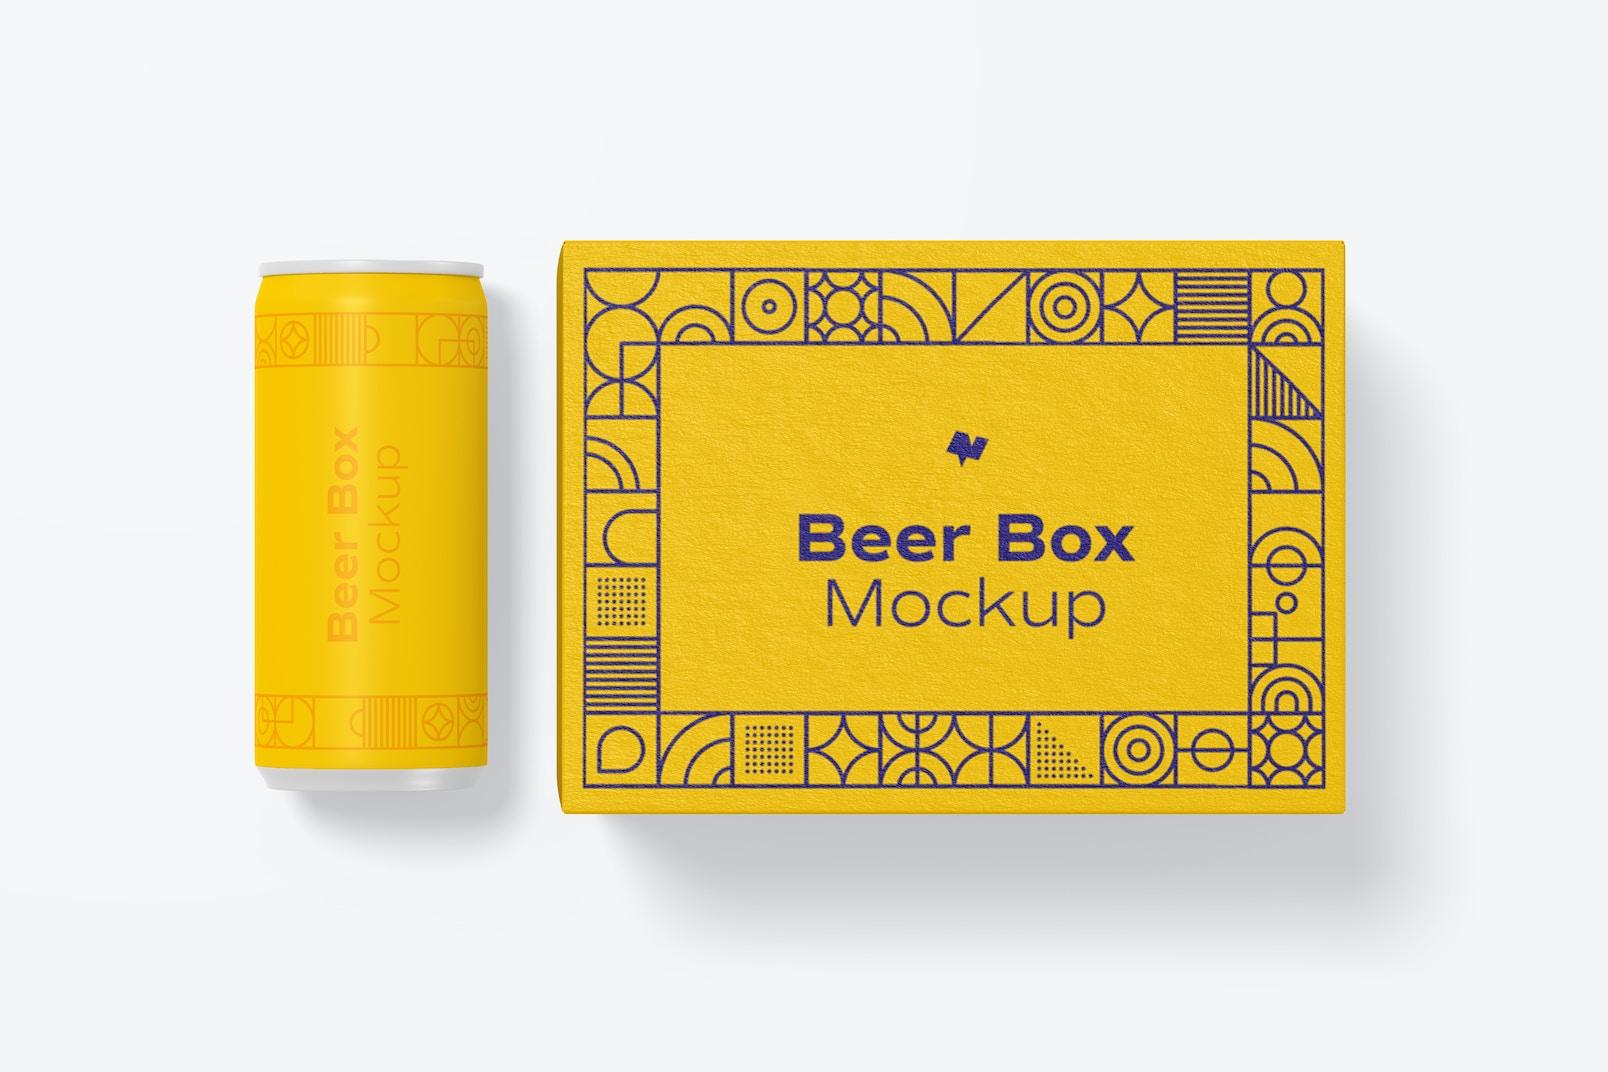 Beer Box Mockup, Top View